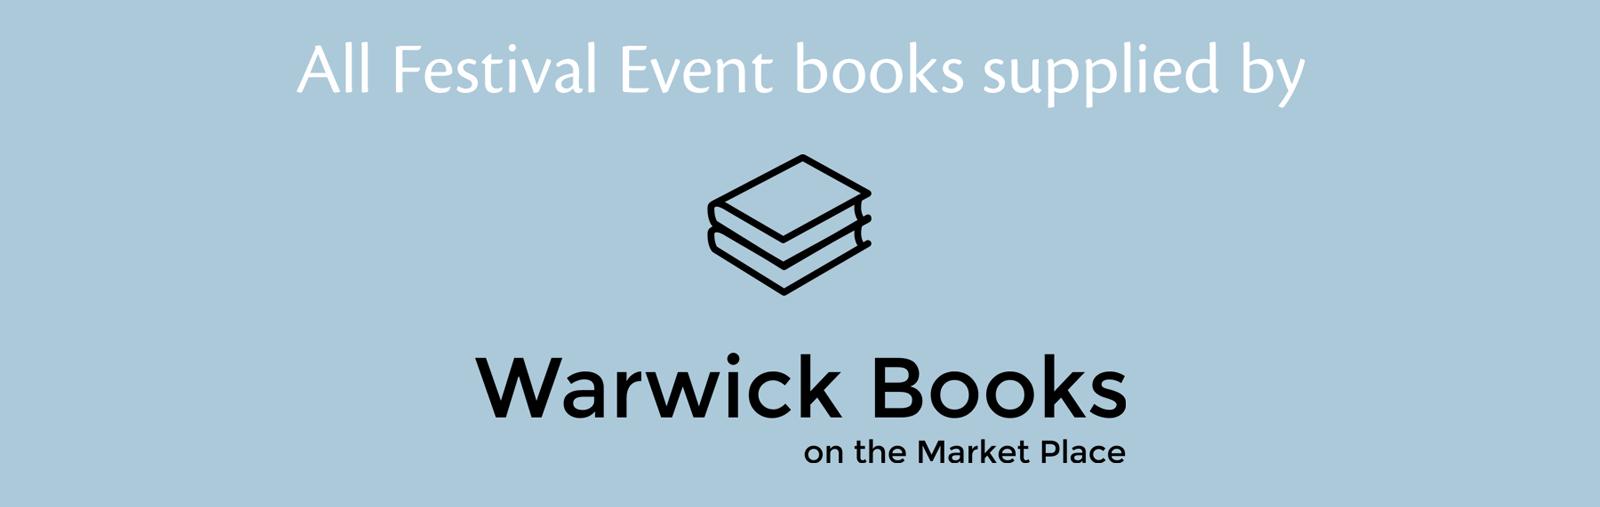 Warwick Books 2020 Wide